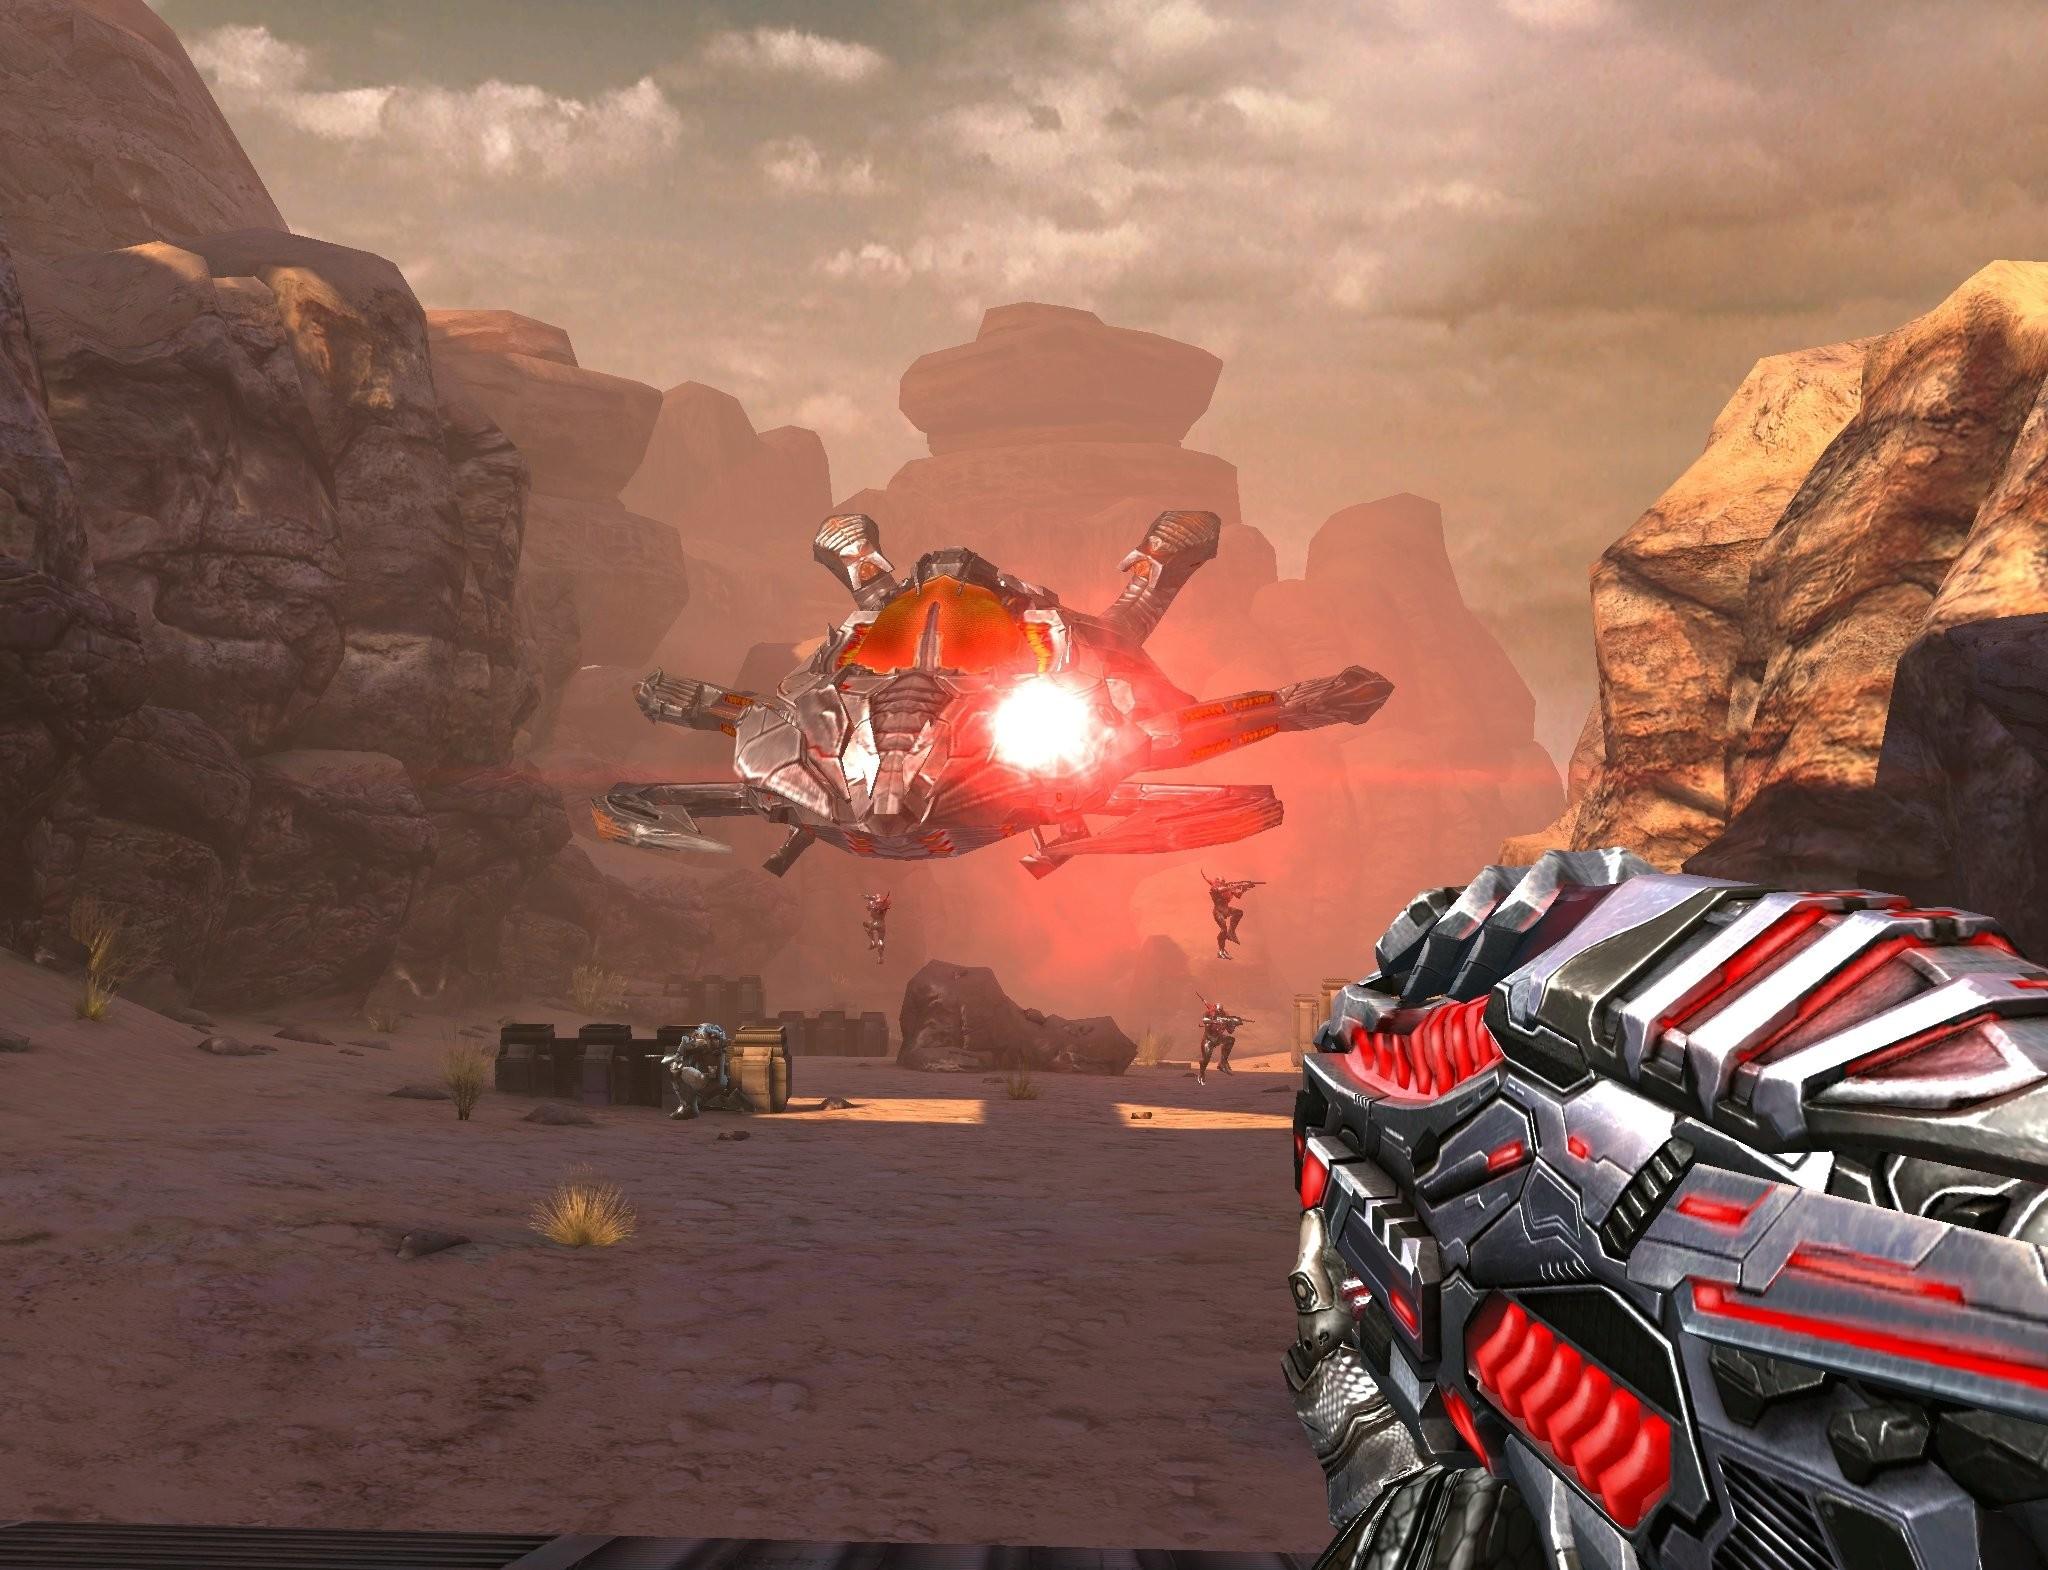 NOVA Near Orbit Vanguard Alliance sci-fi action adventure fps shooter 1nova  warrior wallpaper     580318   WallpaperUP